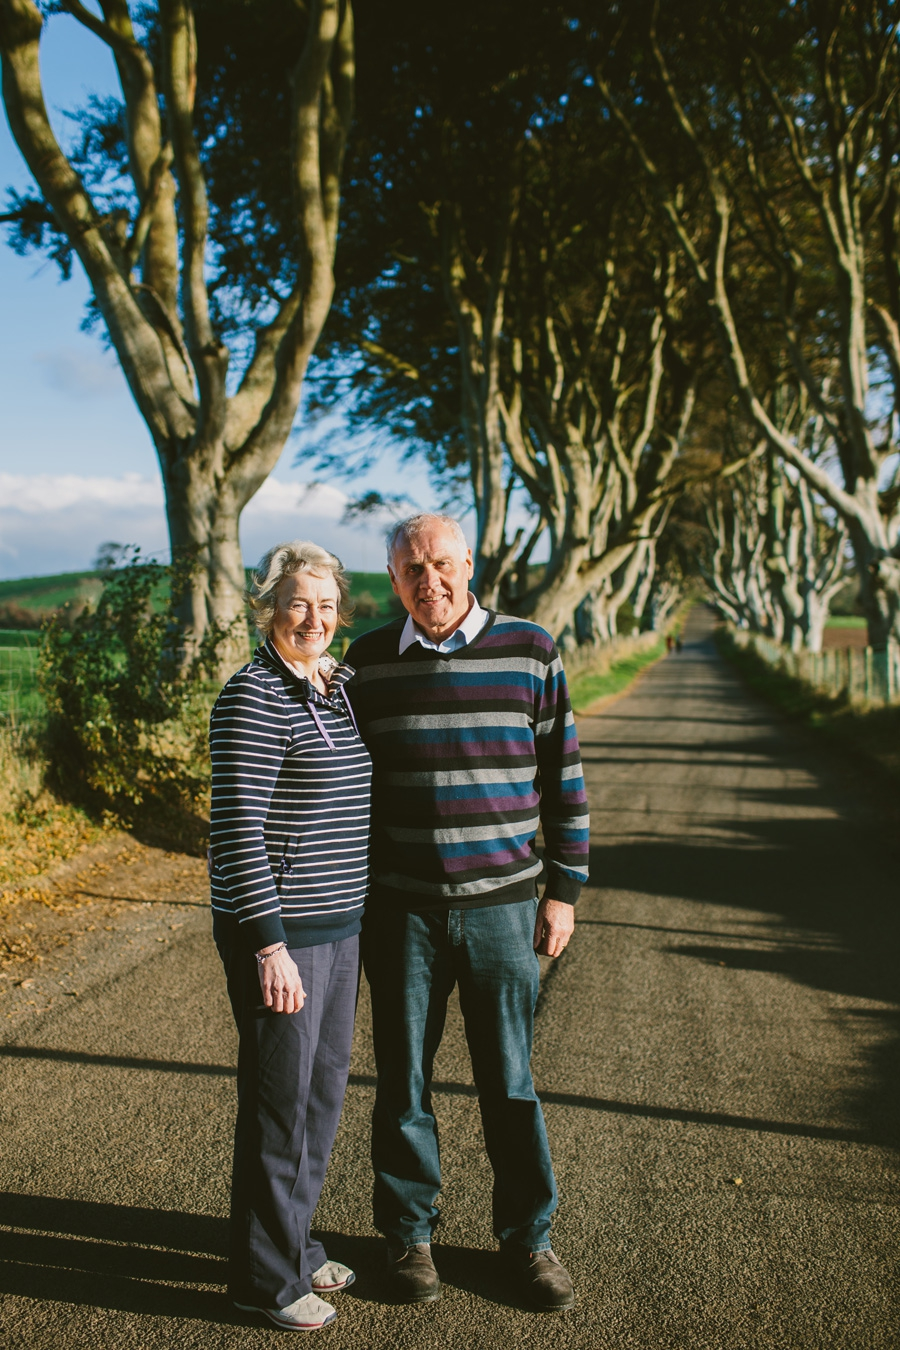 Family Portrait Photography Ireland